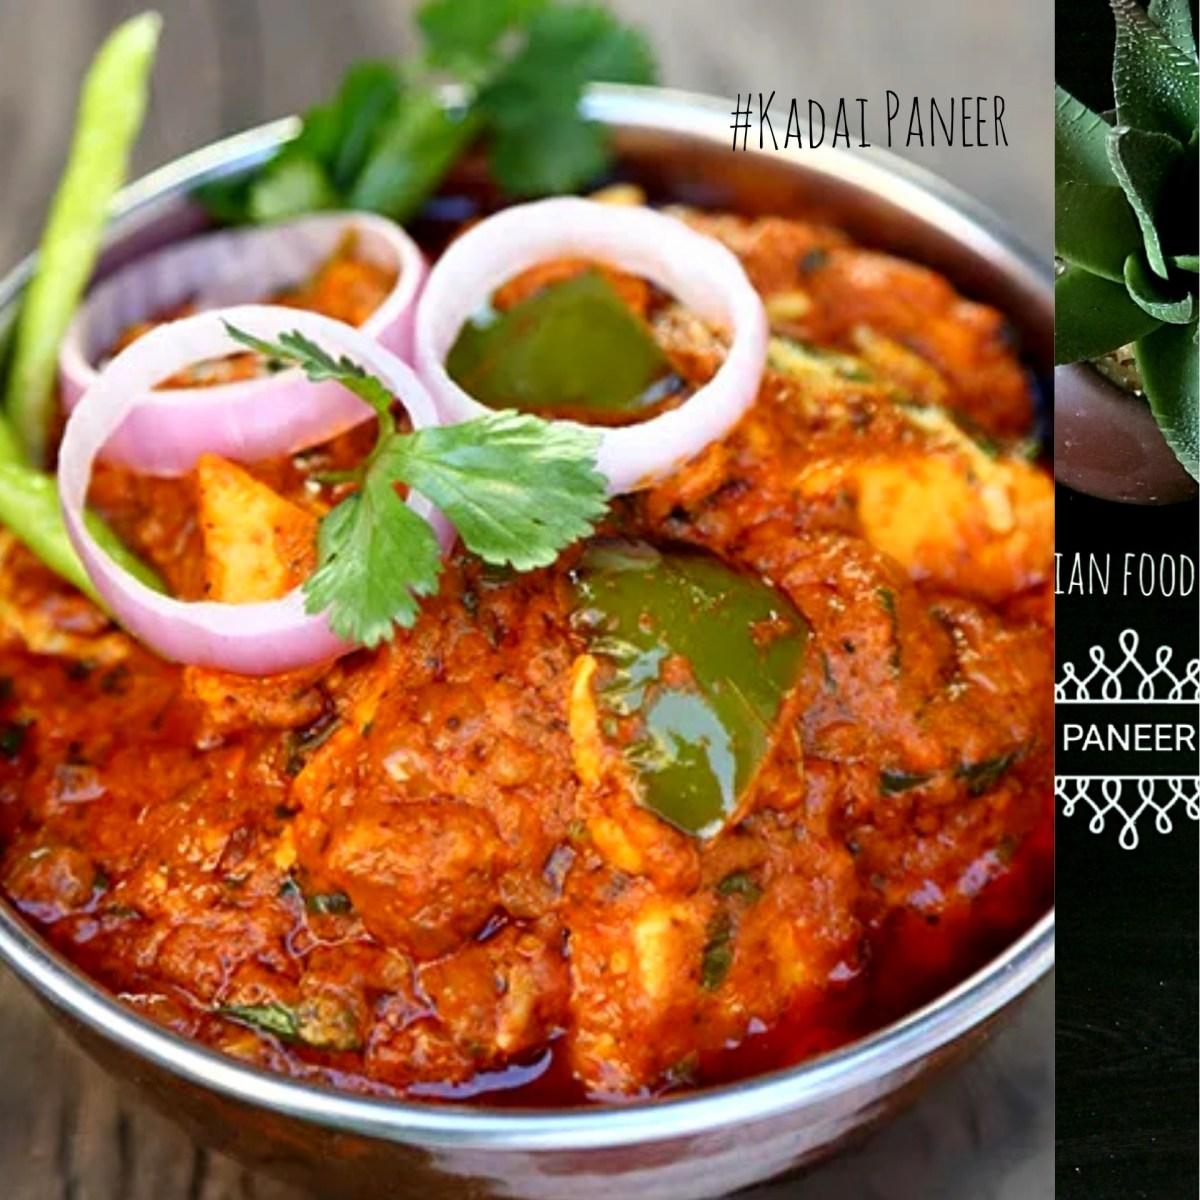 Kadai Paneer | Karahi Paneer | Kadai Paneer Gravy Restaurant Style | 4.60/5.0